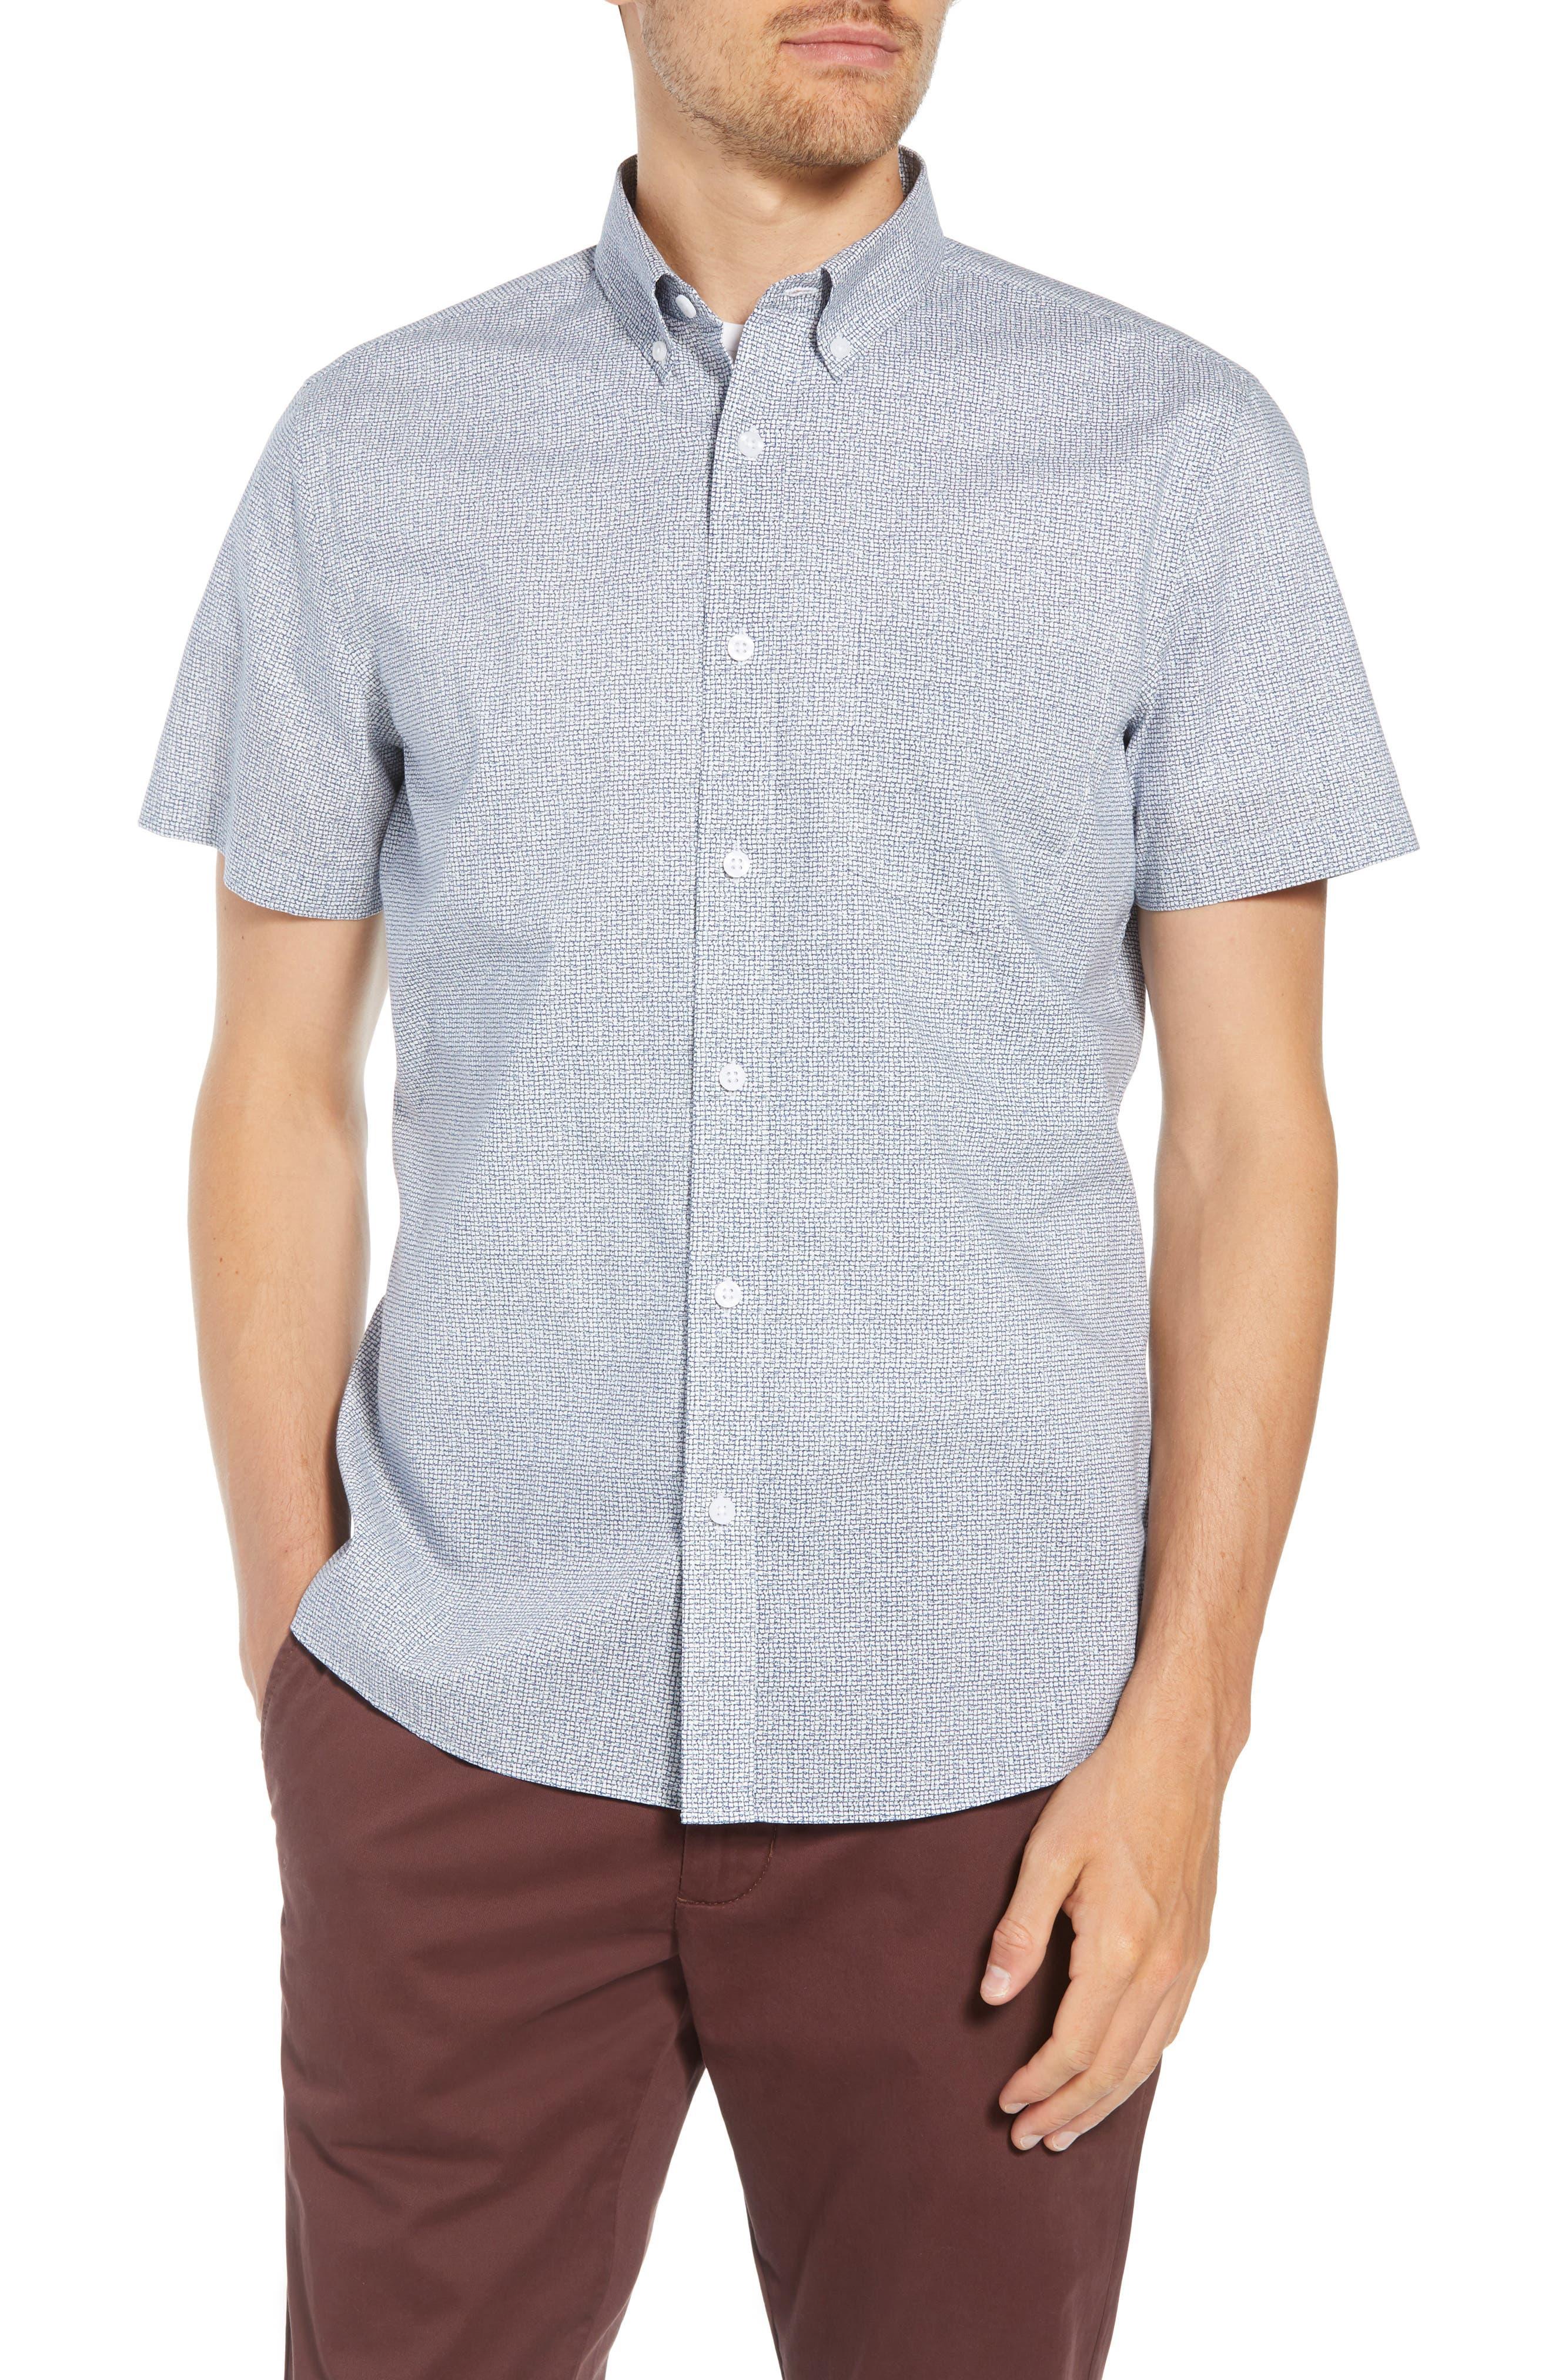 Ivy Trim Fit Print Sport Shirt,                             Main thumbnail 1, color,                             NAVY IRIS TEXTURED GRID